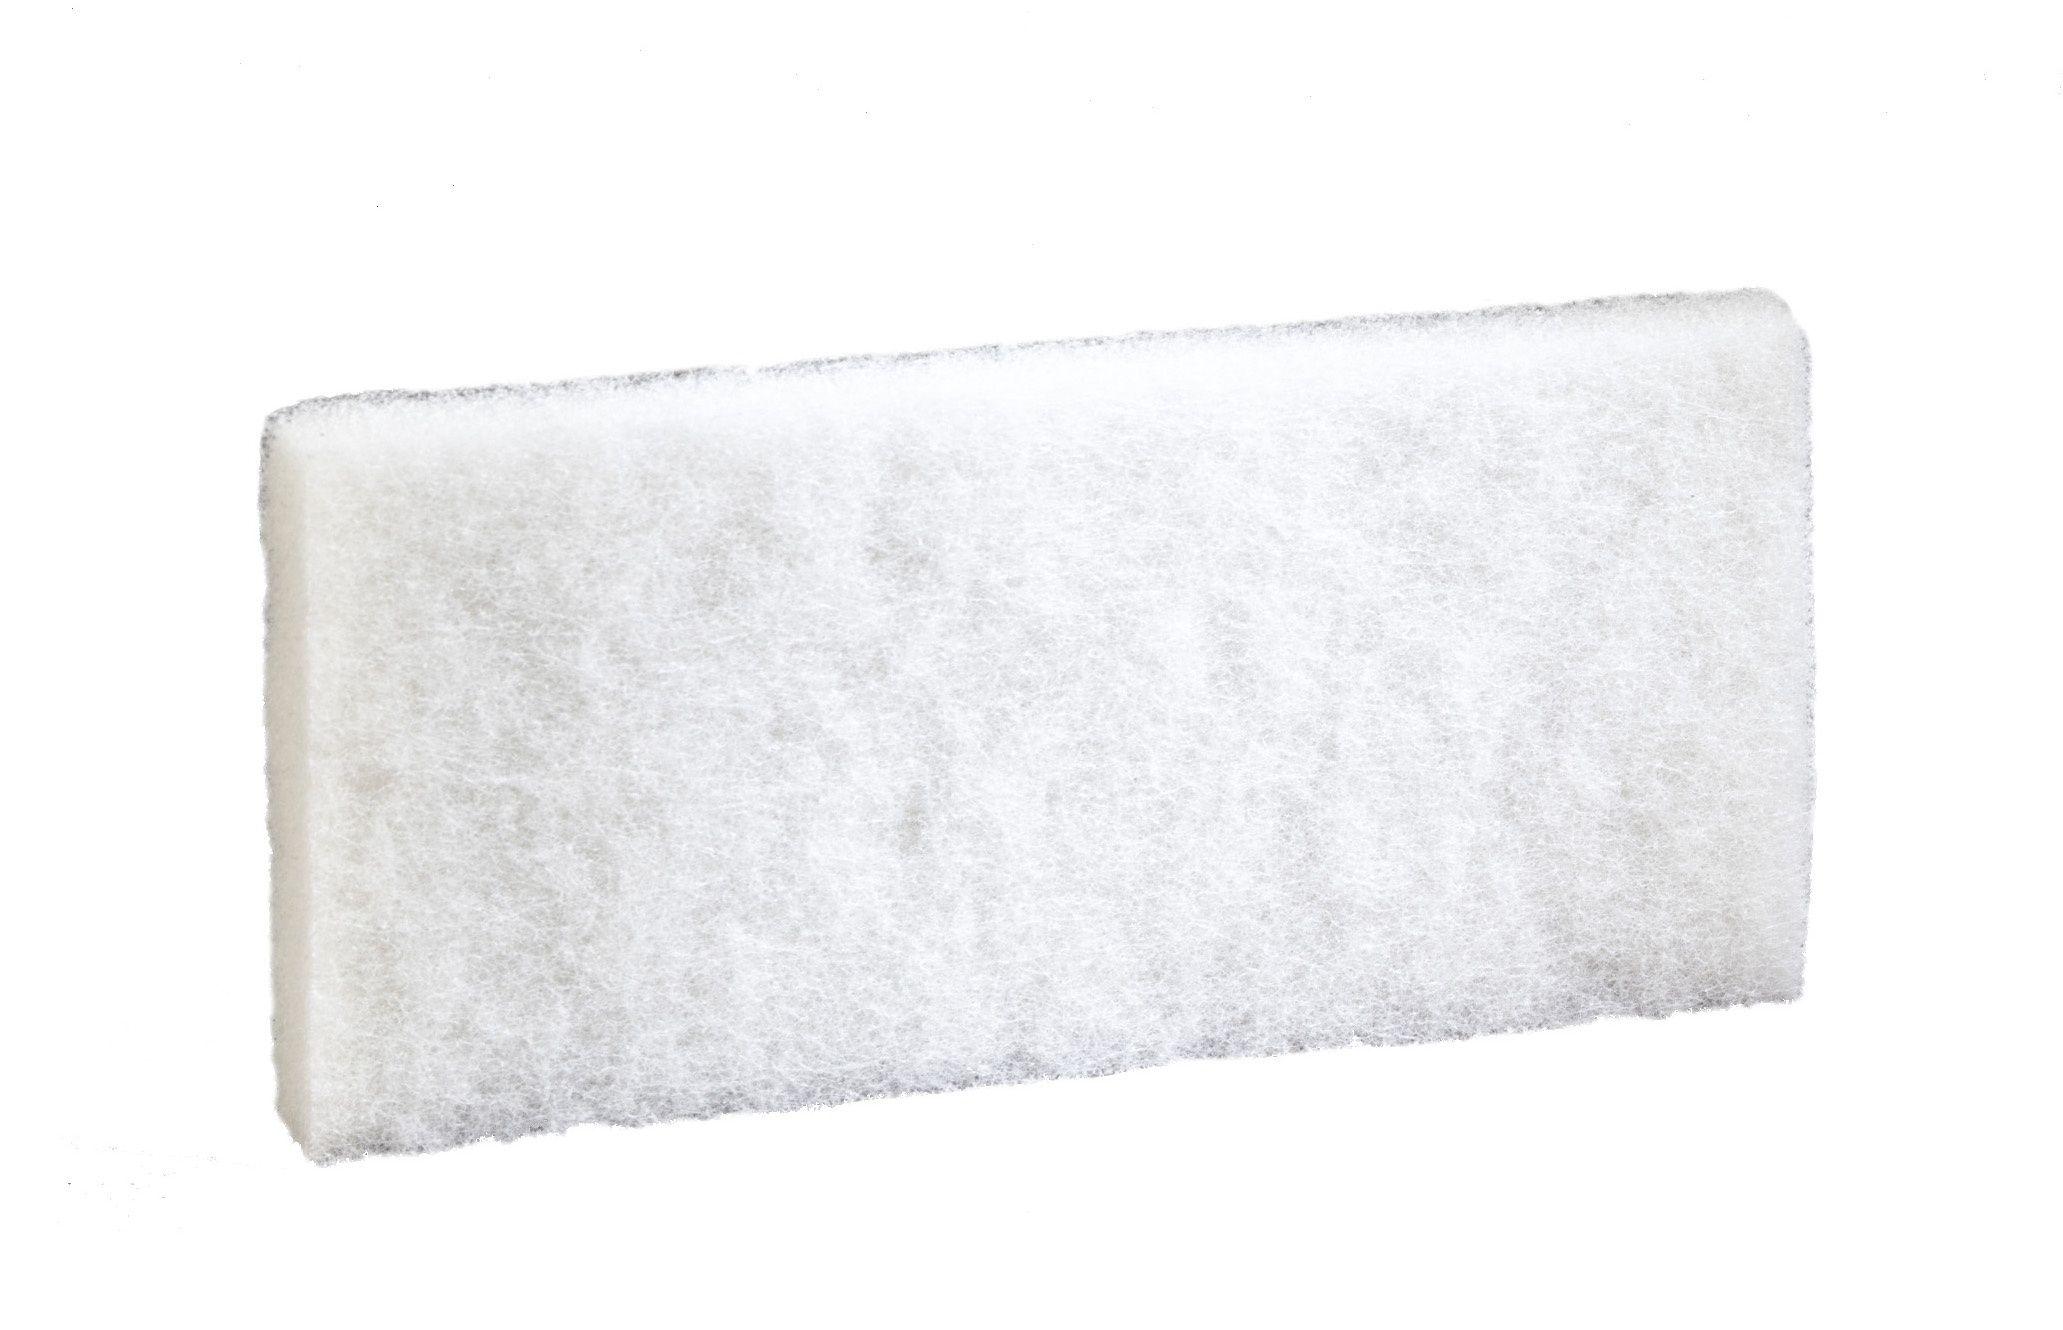 Håndpad 3M Doodlebug 118x254mm hvit (3) 008440